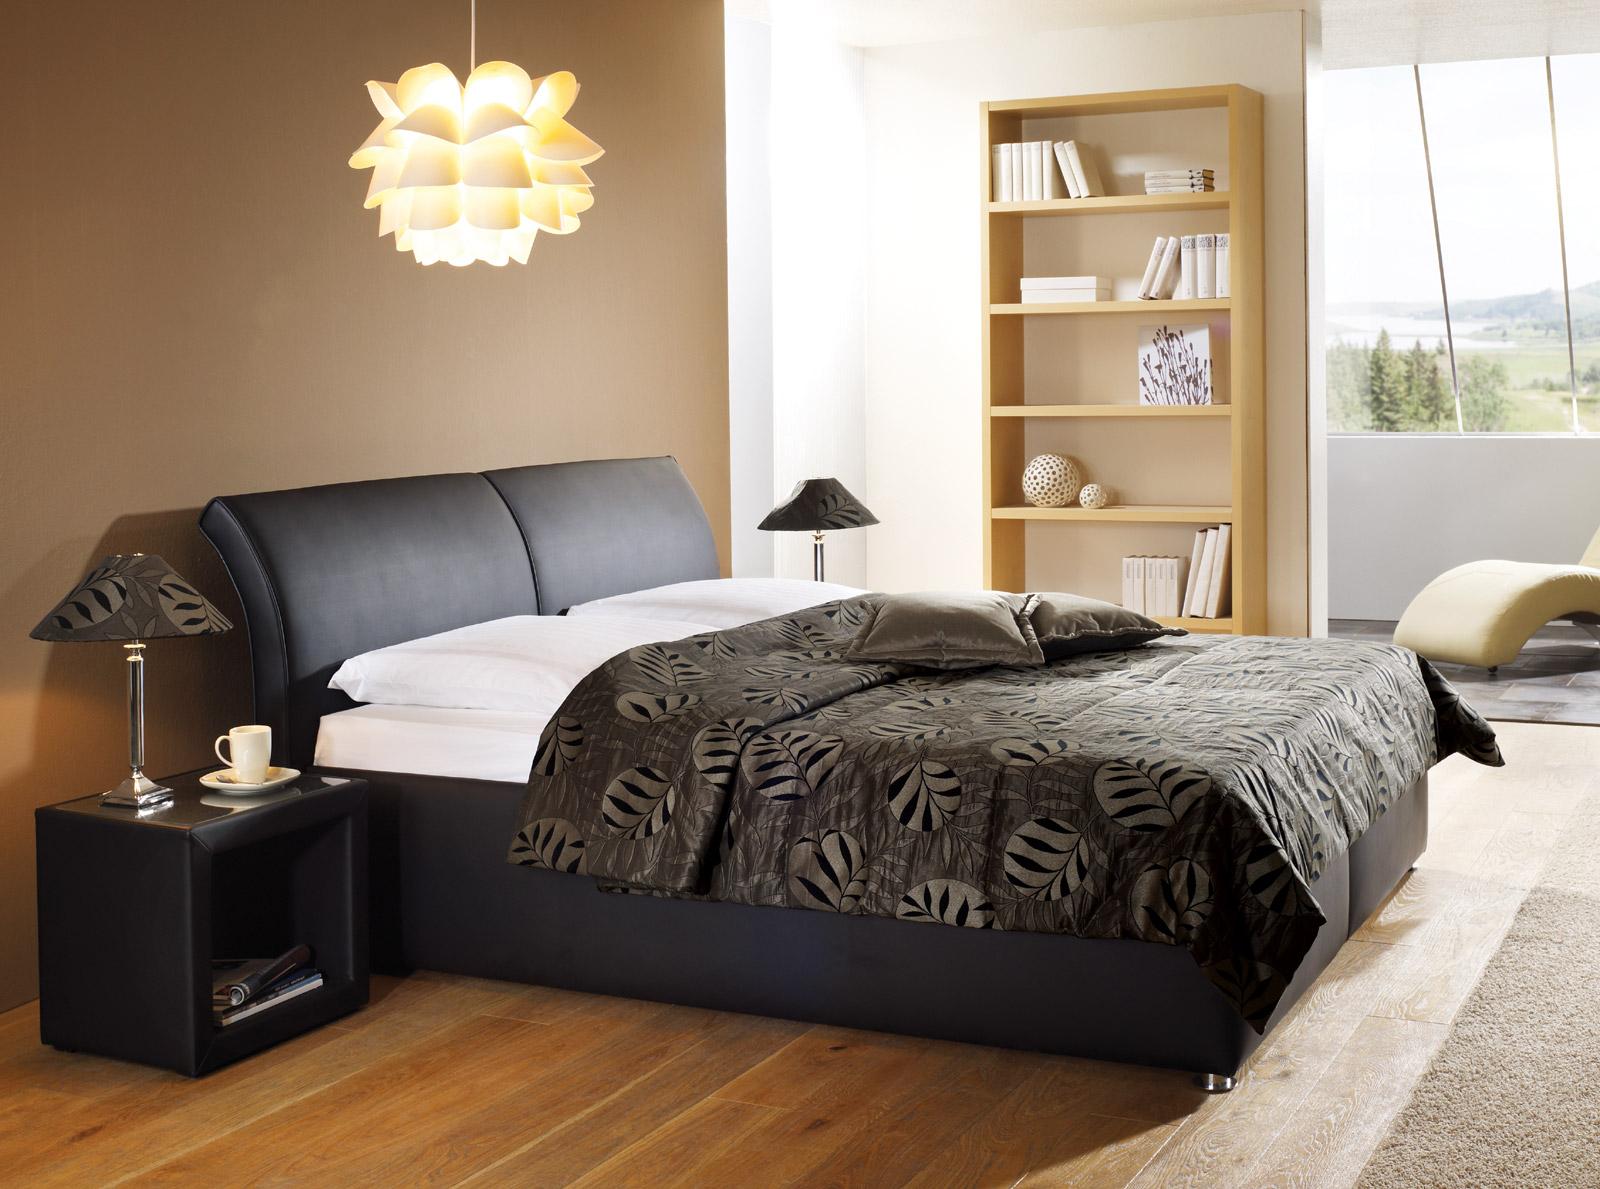 Full Size of Polsterbetten Gnstig Online Im Shop Kaufen Bettende Bett Betten.de